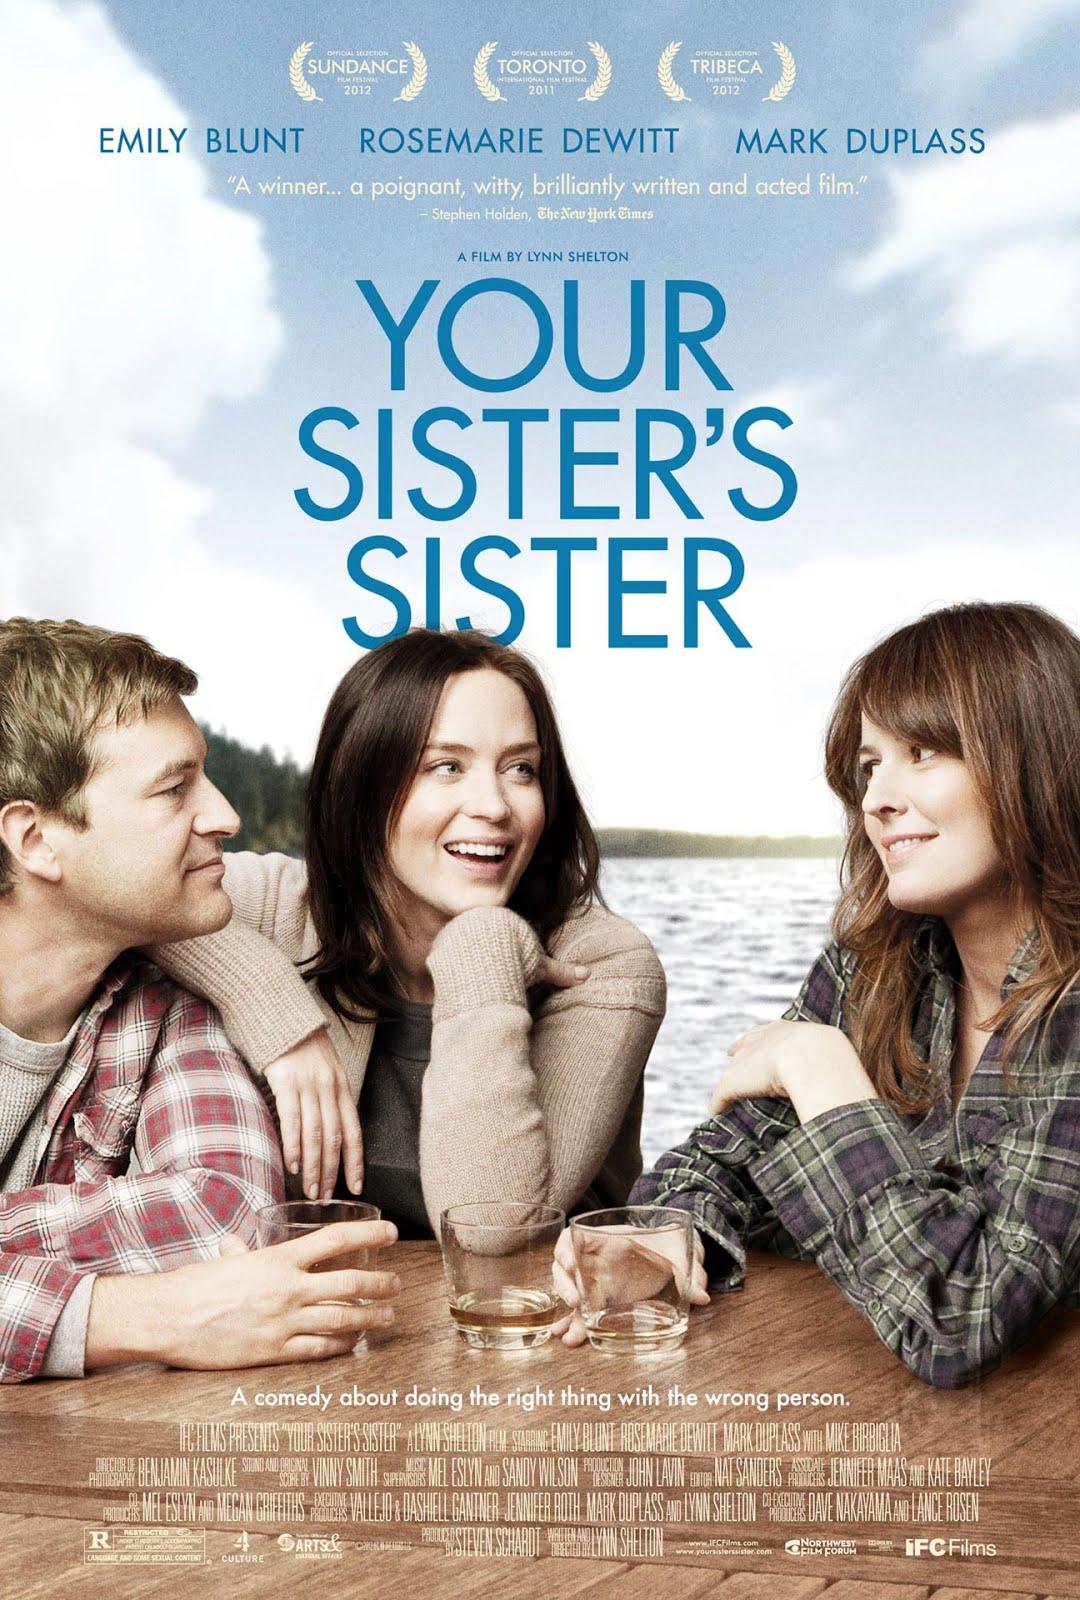 http://3.bp.blogspot.com/-m8Aun__bi5s/UIrkbZfBBhI/AAAAAAAAFH0/fIc-kpR-PSg/s1600/Your_Sisters_Sister_poster_dewitt_blunt.jpg